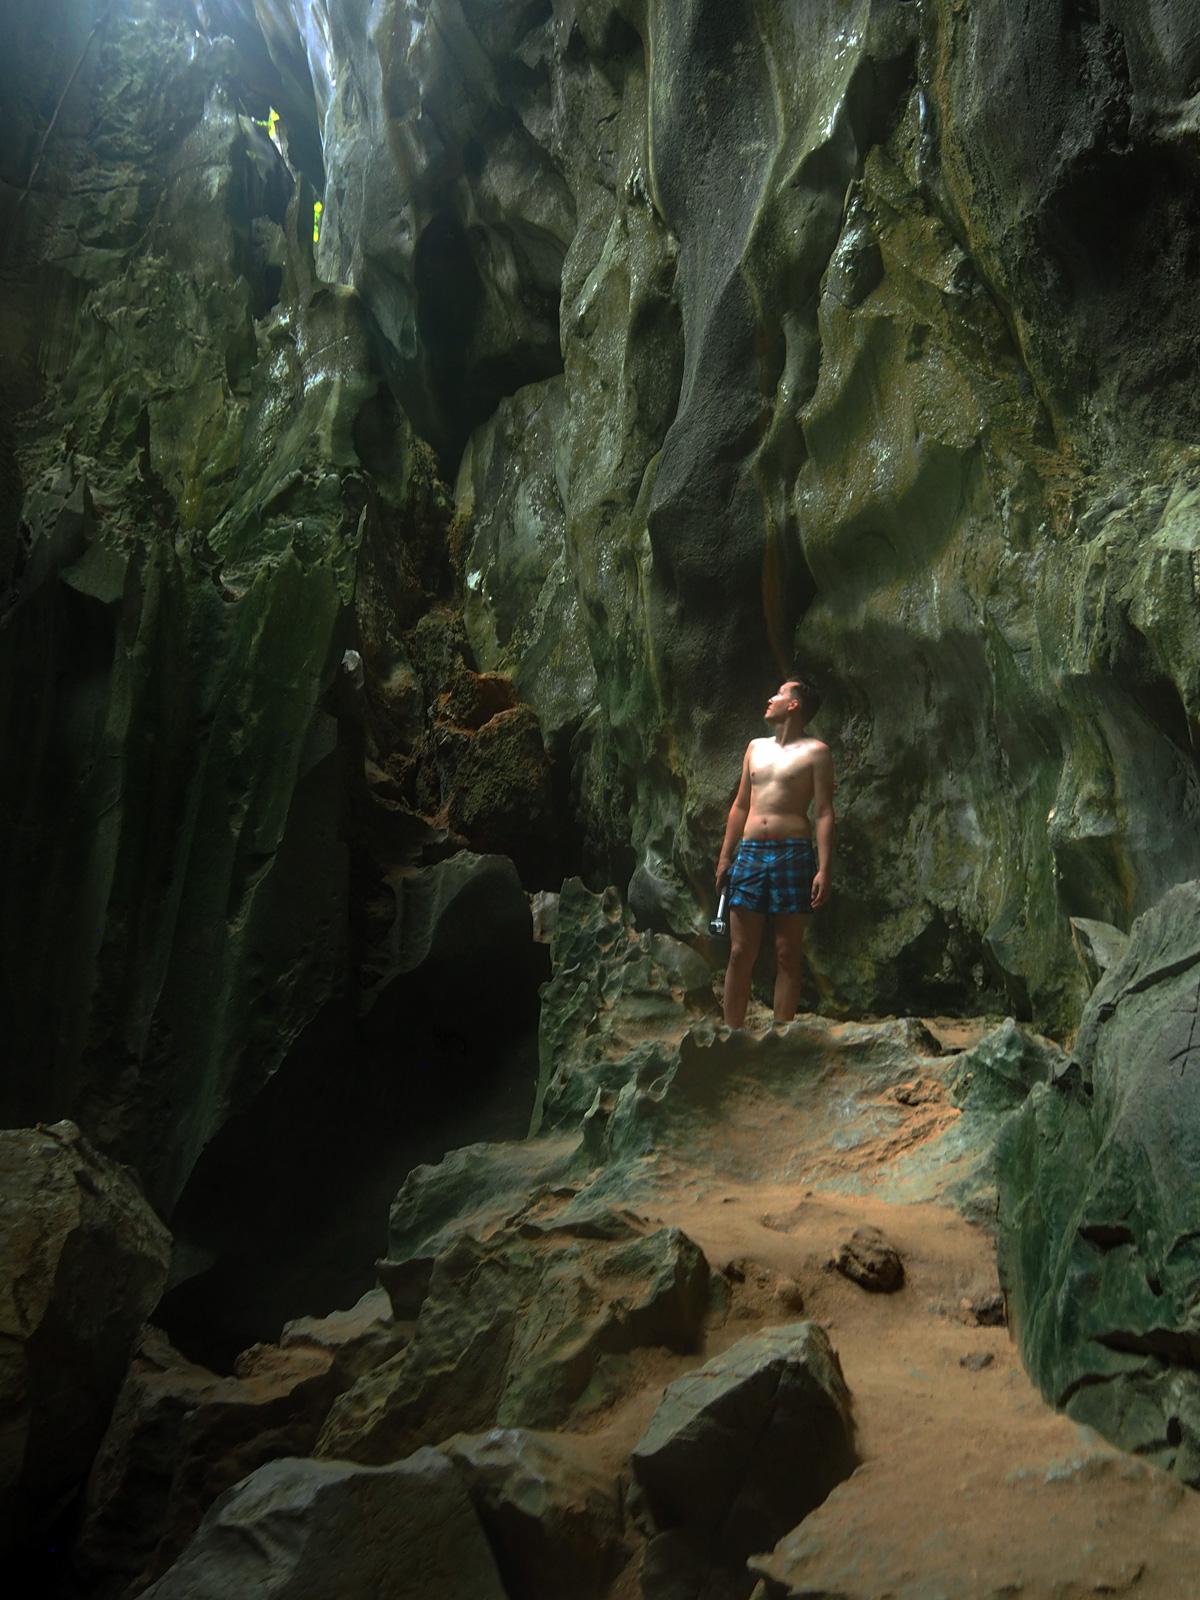 codognon_cave_el_nido_philippines